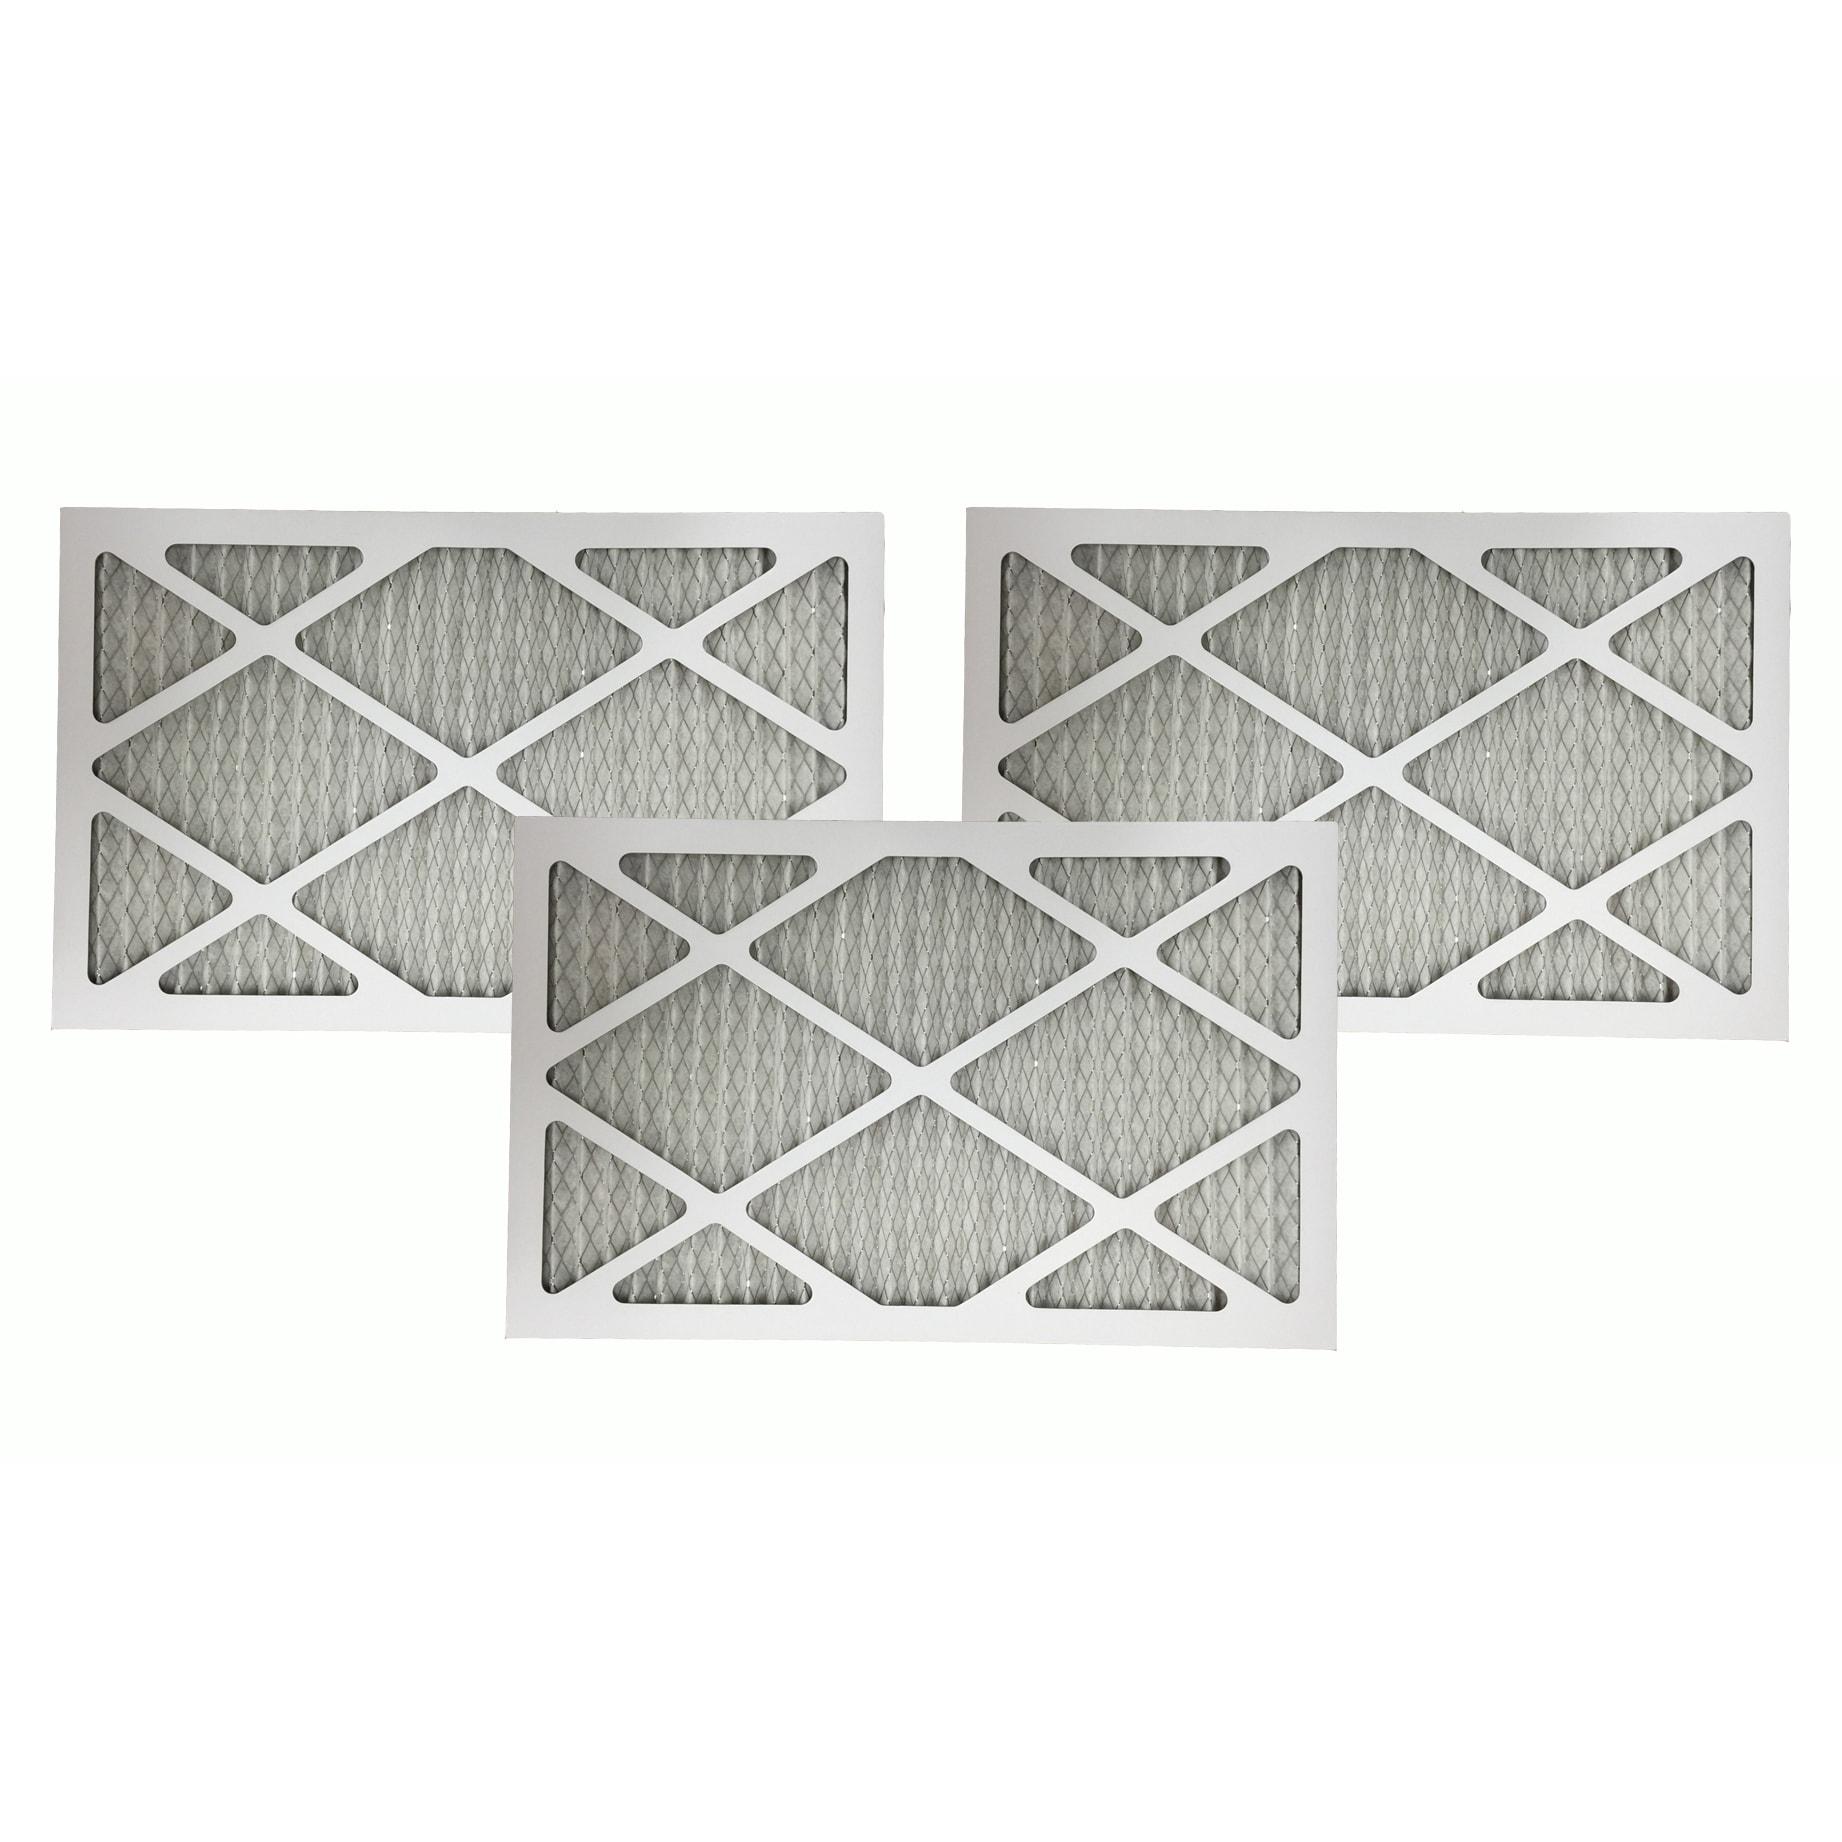 Crucial 3 Merv 11 Allergen Air Furnace Filters 16x25x1 (a...